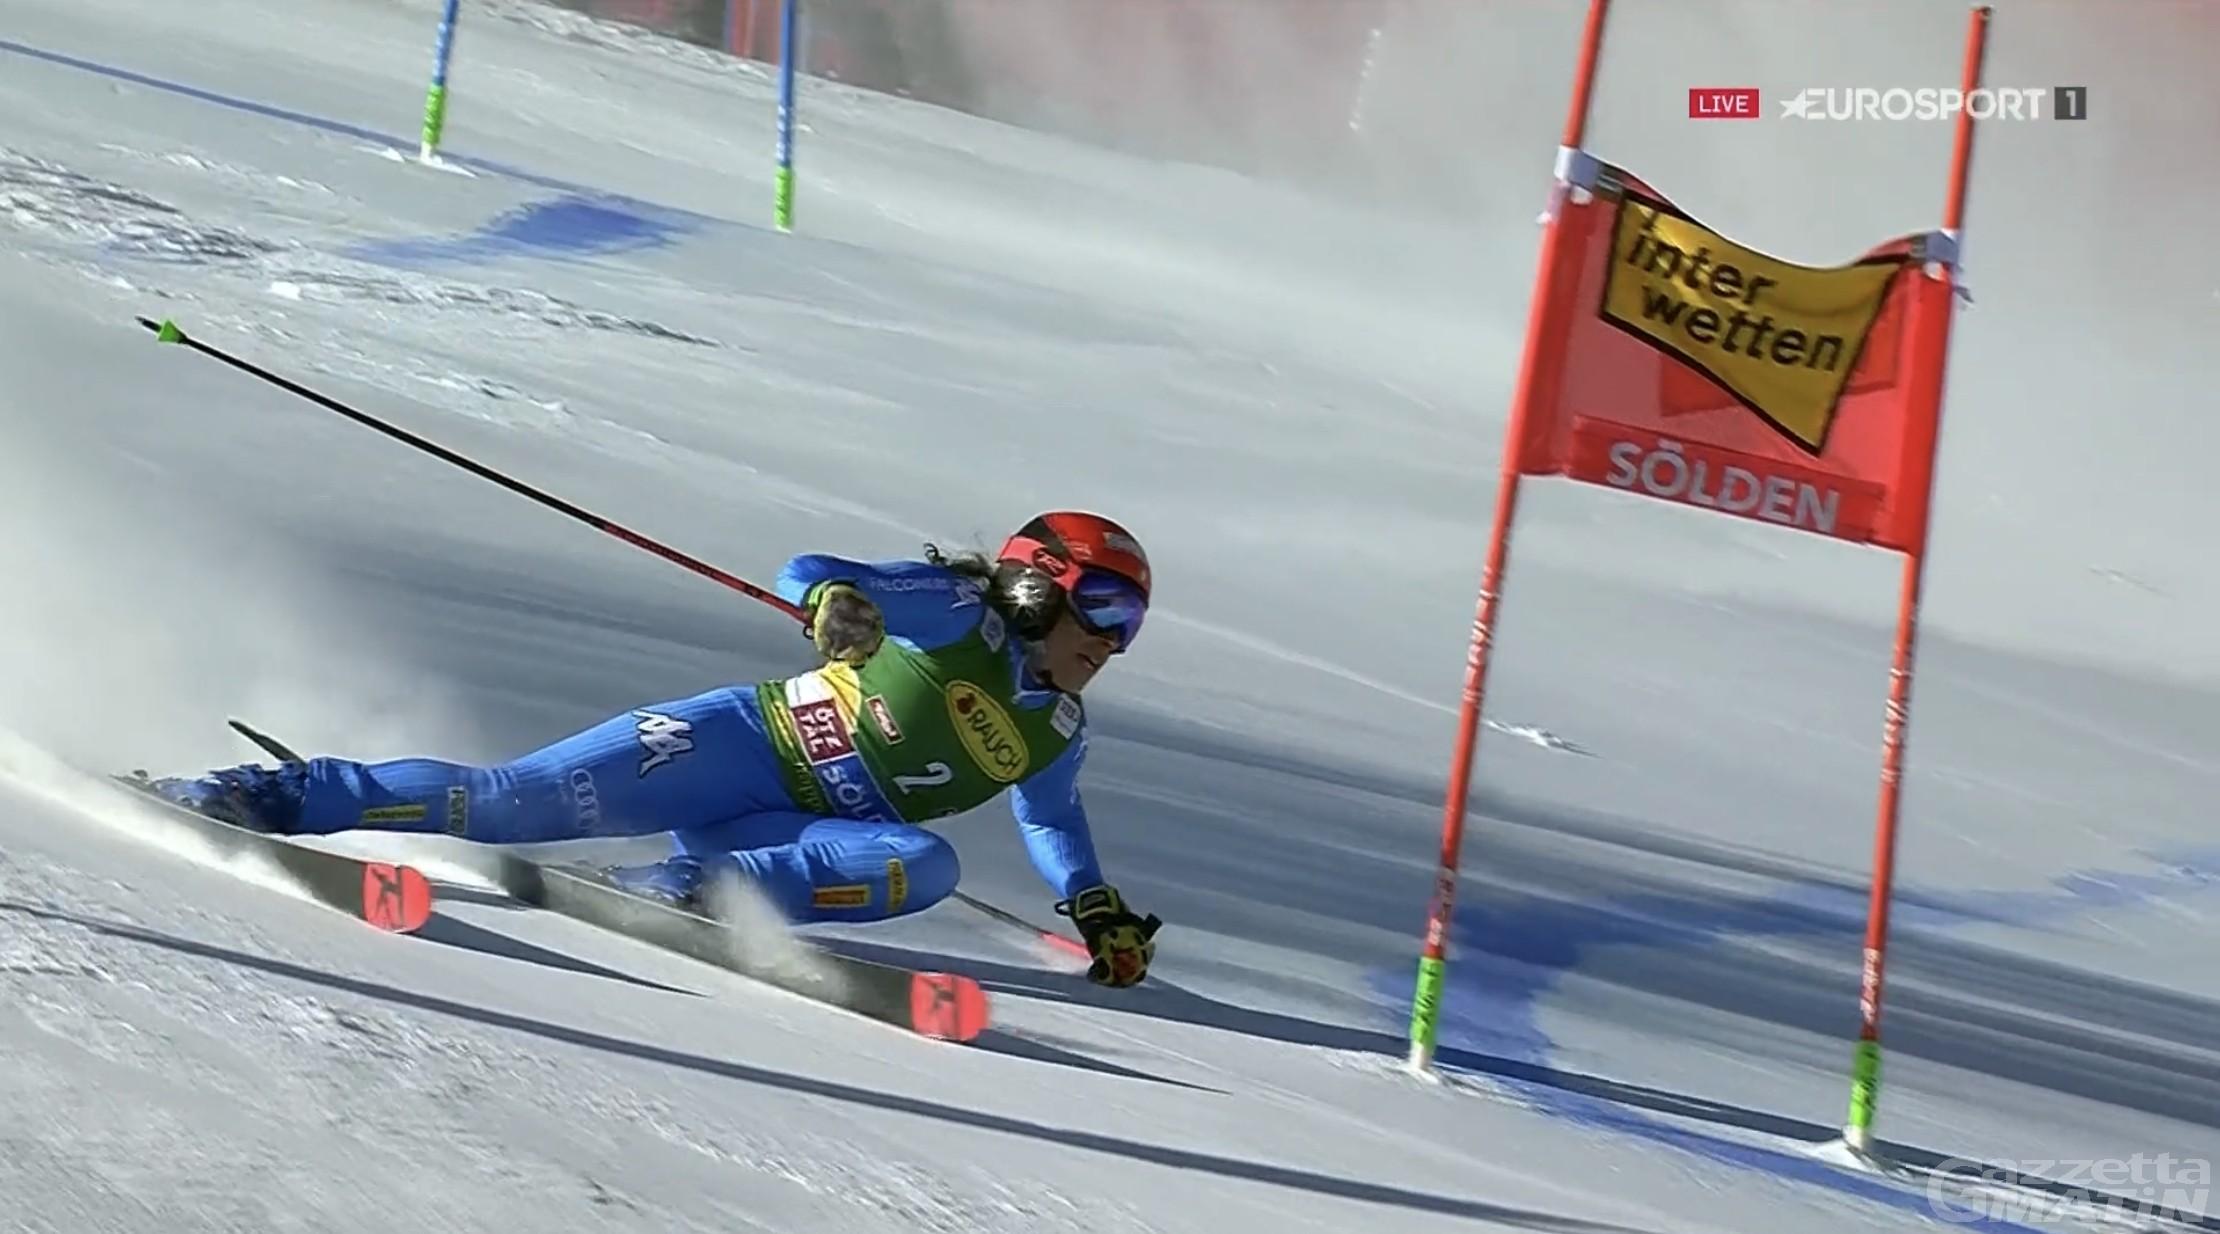 Sci alpino: a Soelden comanda Lara Gut-Behrami, Federica Brignone in ritardo di 1″52